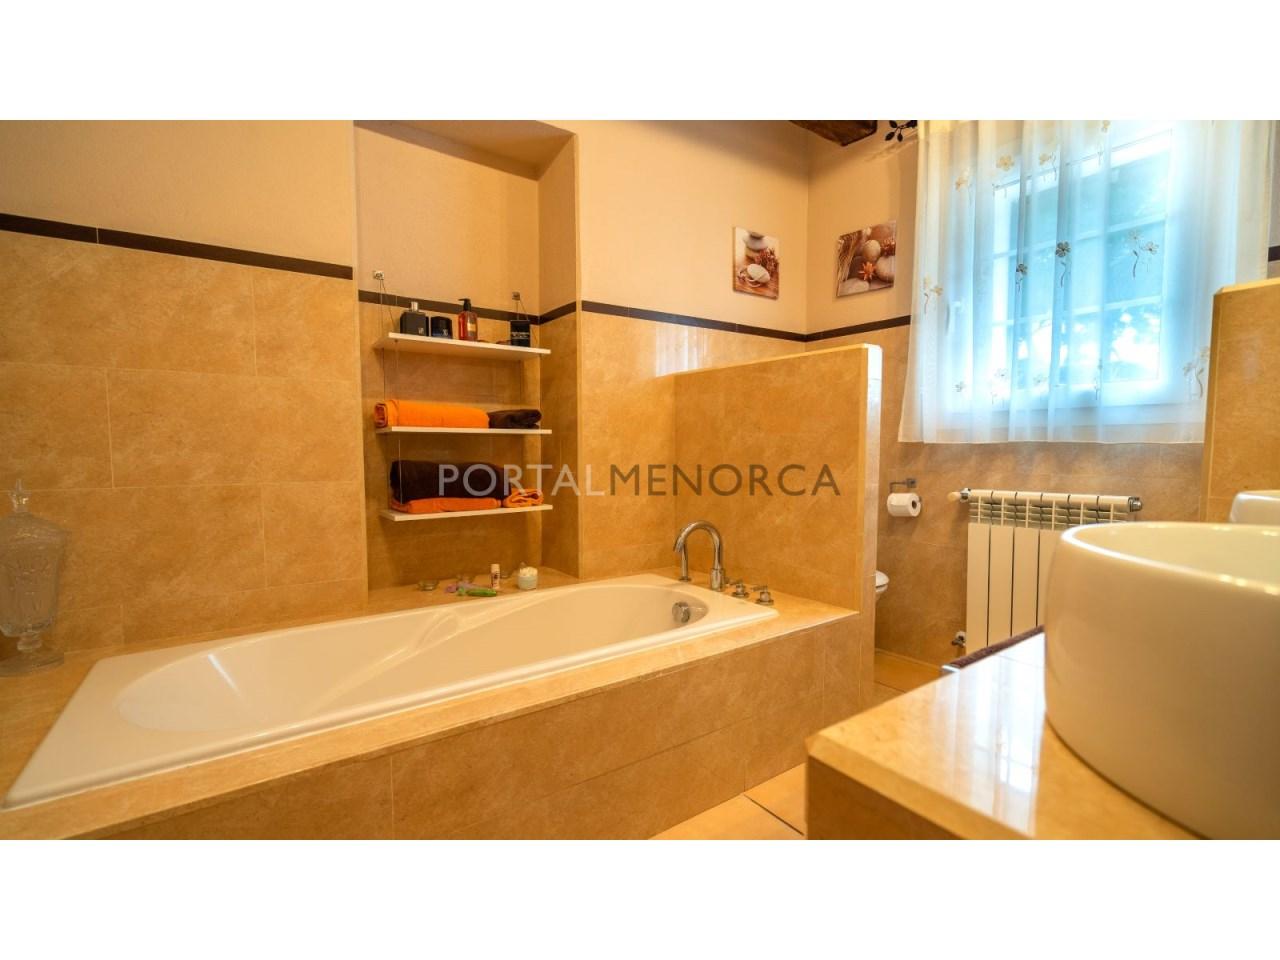 maison-campagne-acheter-menorca (4)